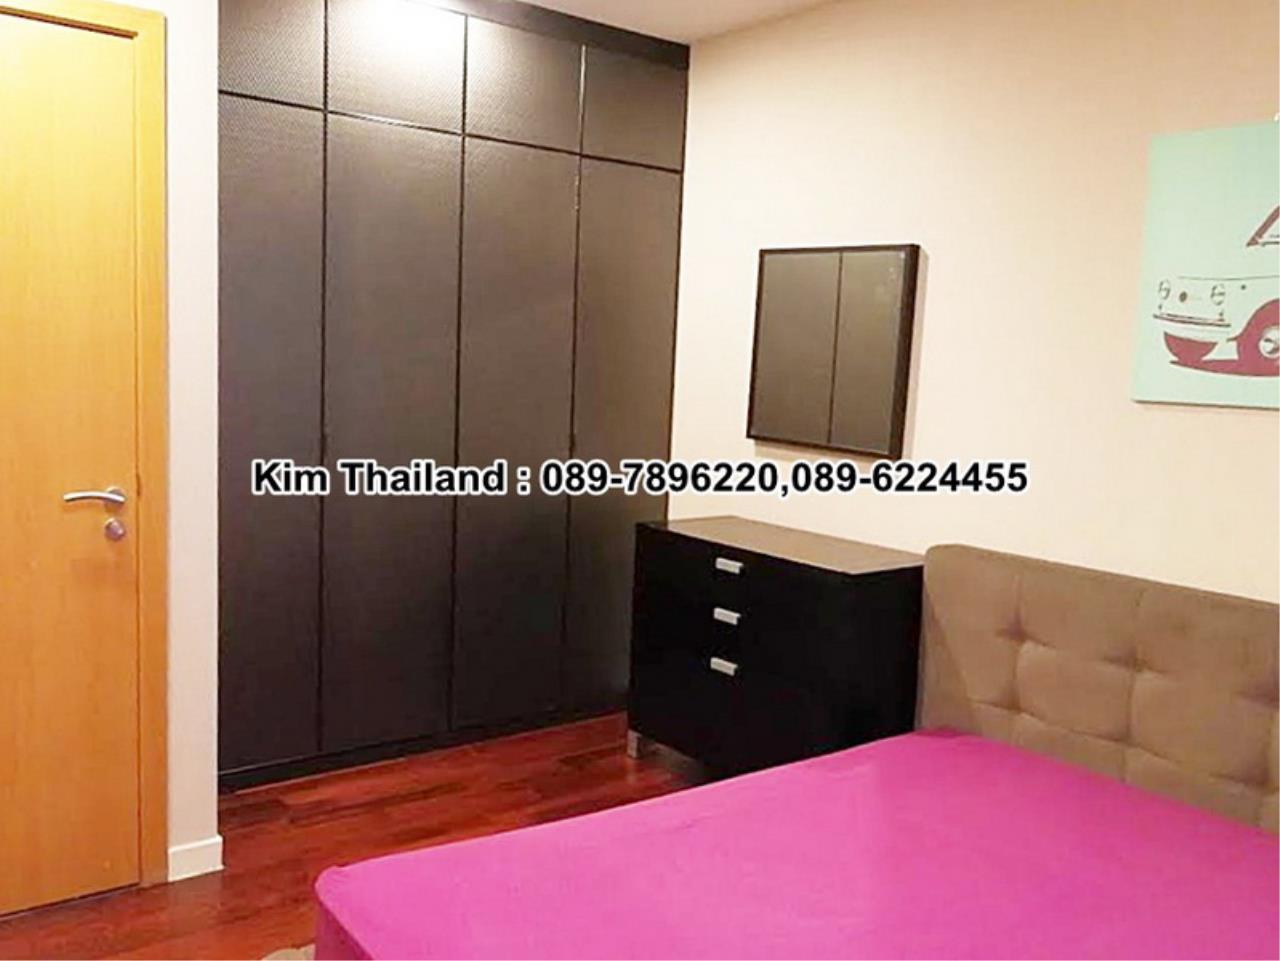 BKKcondorental Agency's For rent, Circle Condominium.  Area 76 sq.m. 2 bedrooms. Rental 35000THB/month. 7